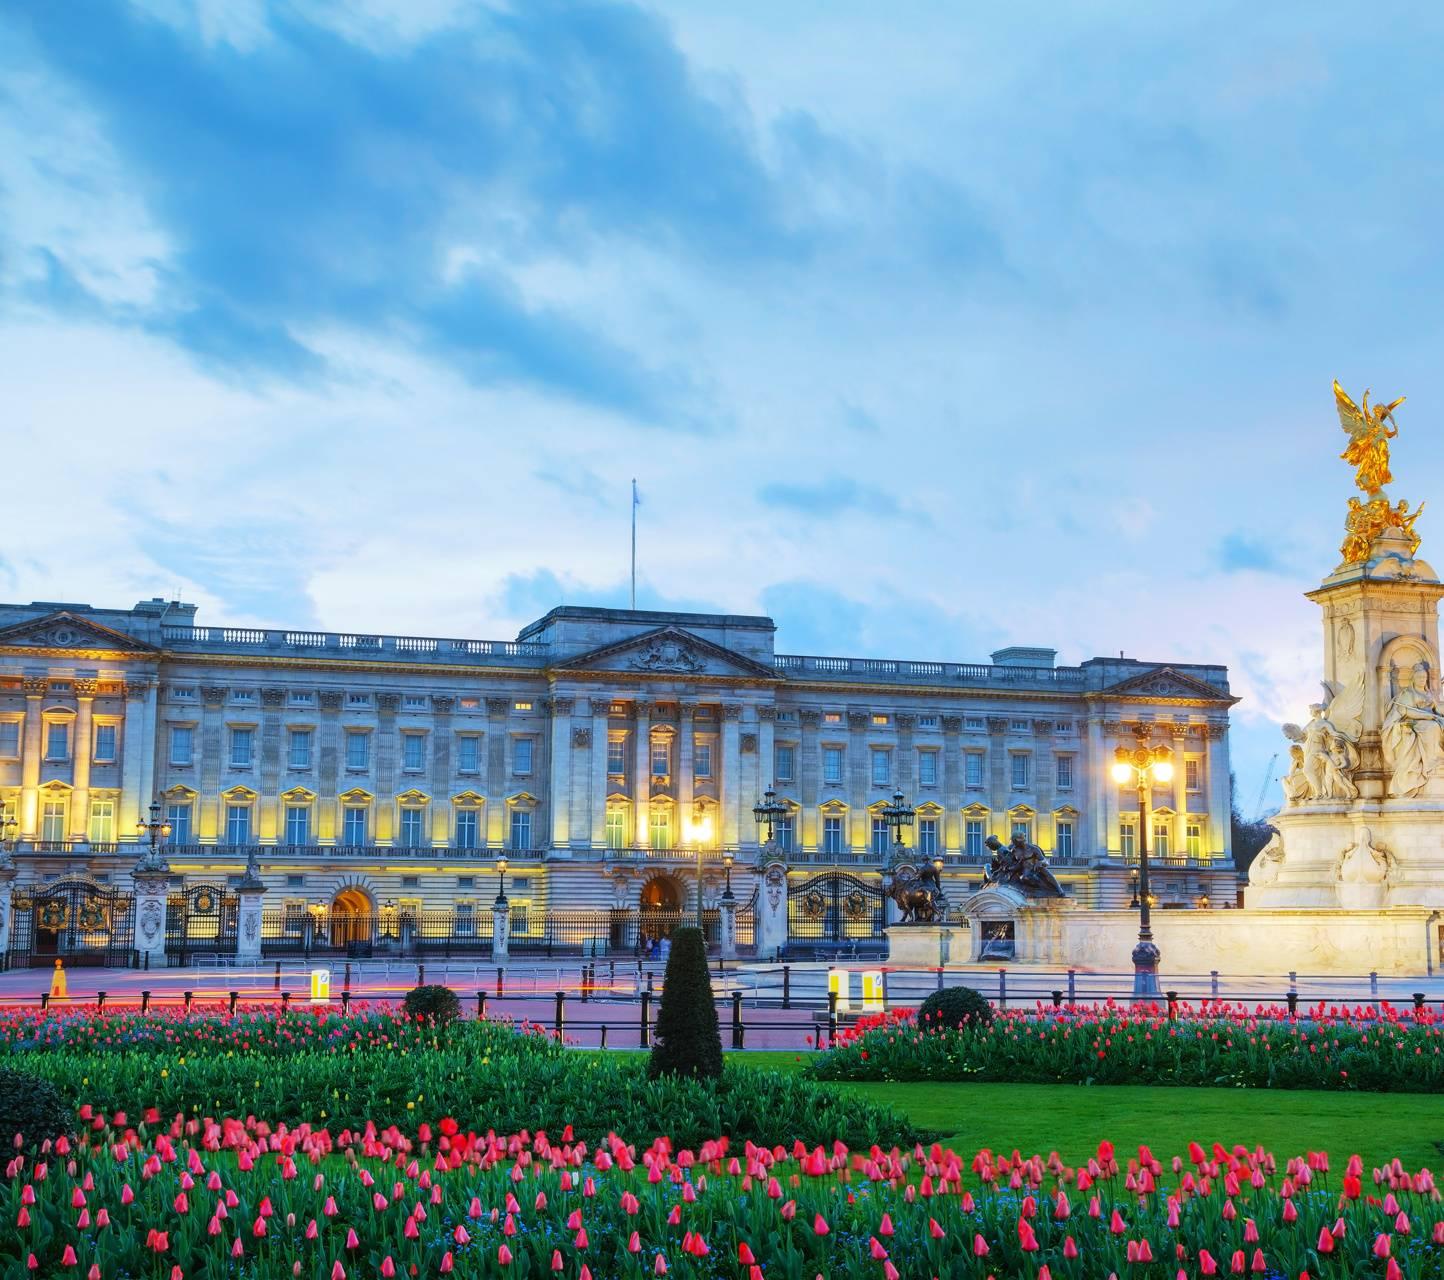 Buckingham Palce